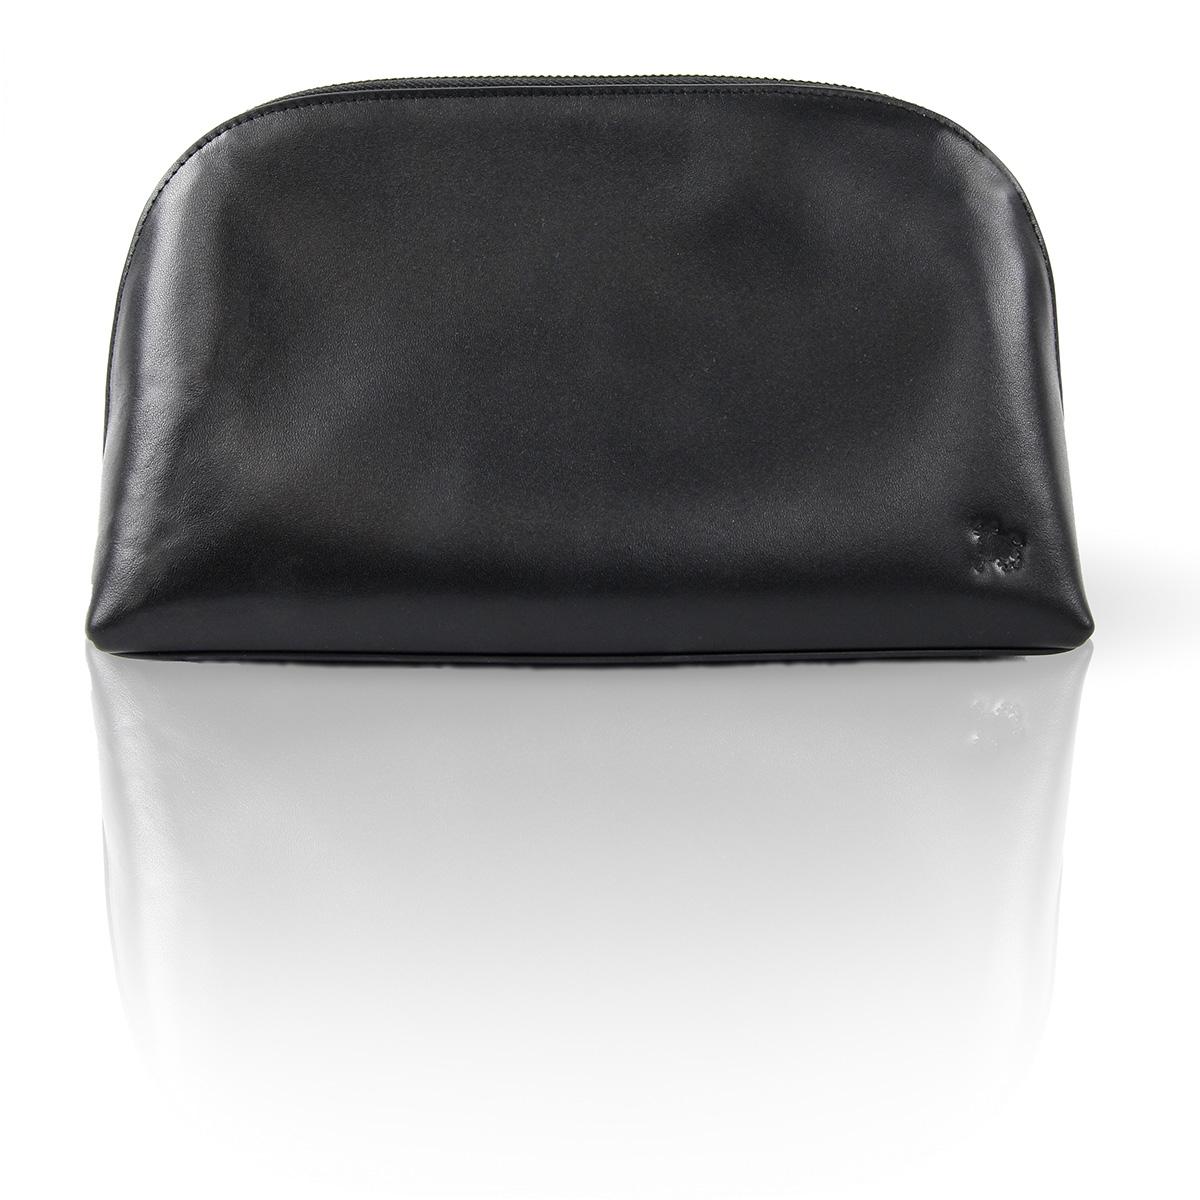 Kosmetiktasche-Damen-schwarz-rot-grau-Kosmetischbeutel-Maku-up-bag-puche-leder-leather_0001_red-inside